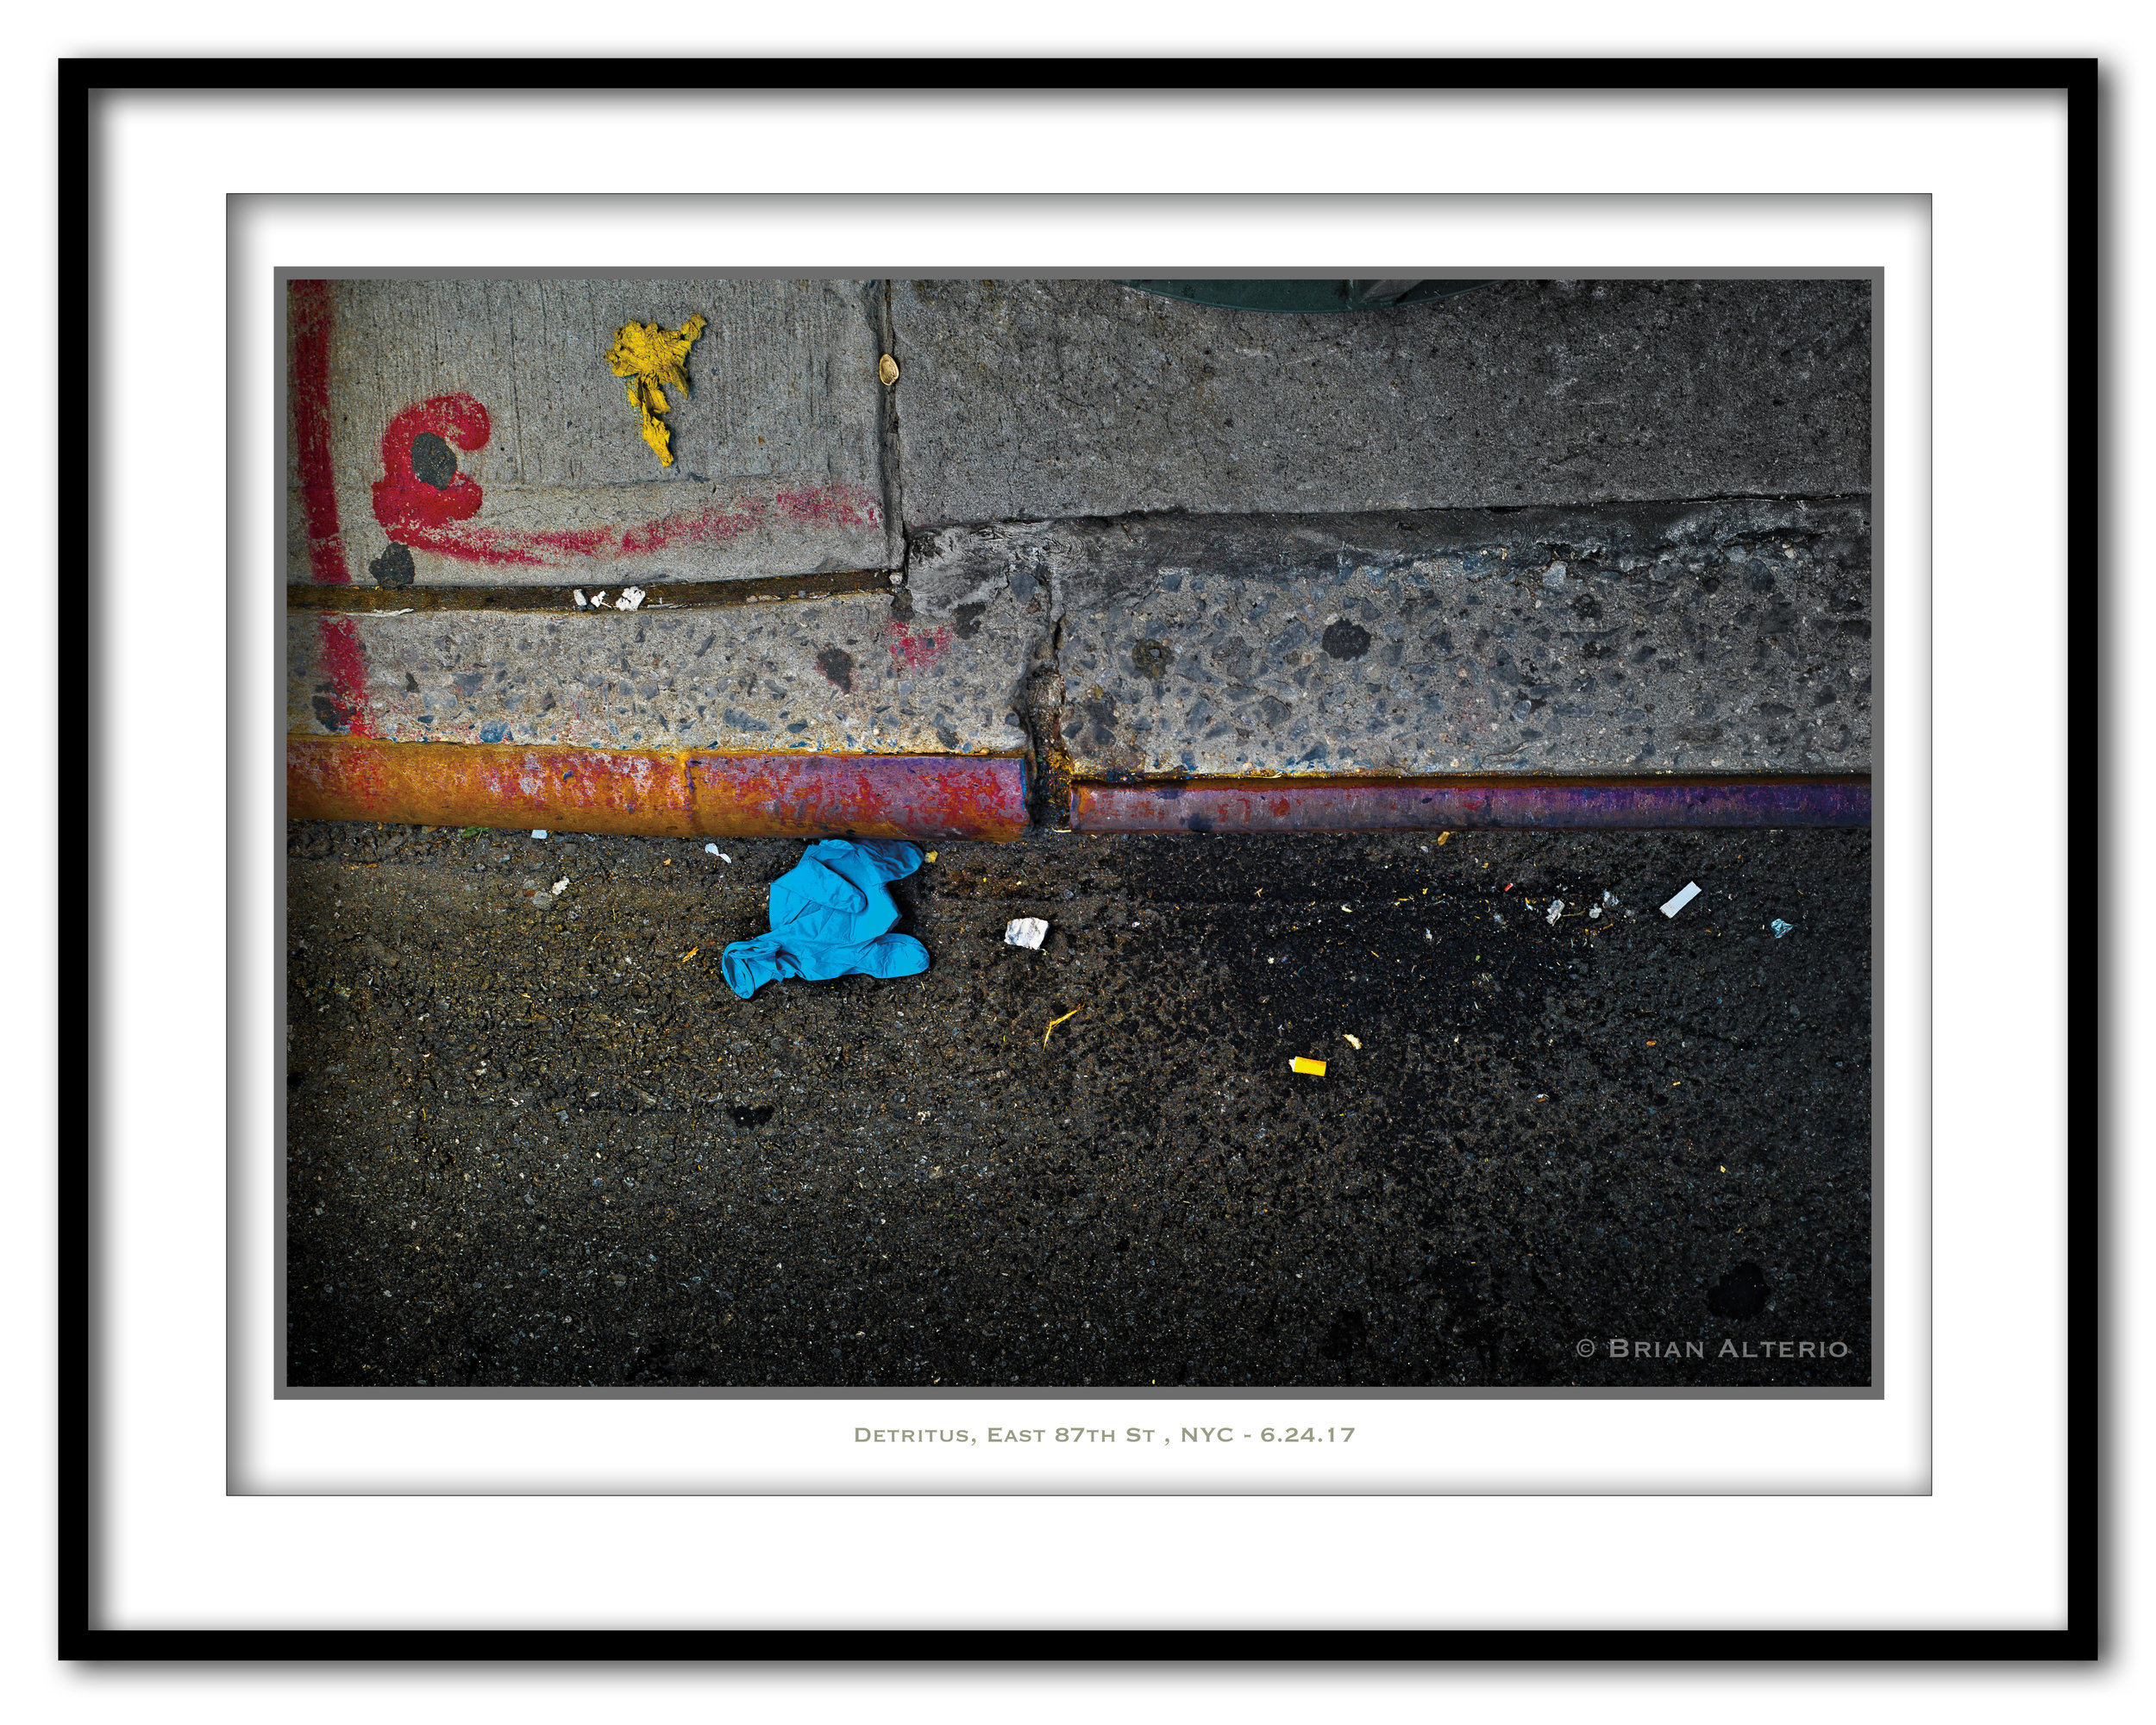 Detritus, East 87th St , NYC - 6.24.17- Framed.jpg